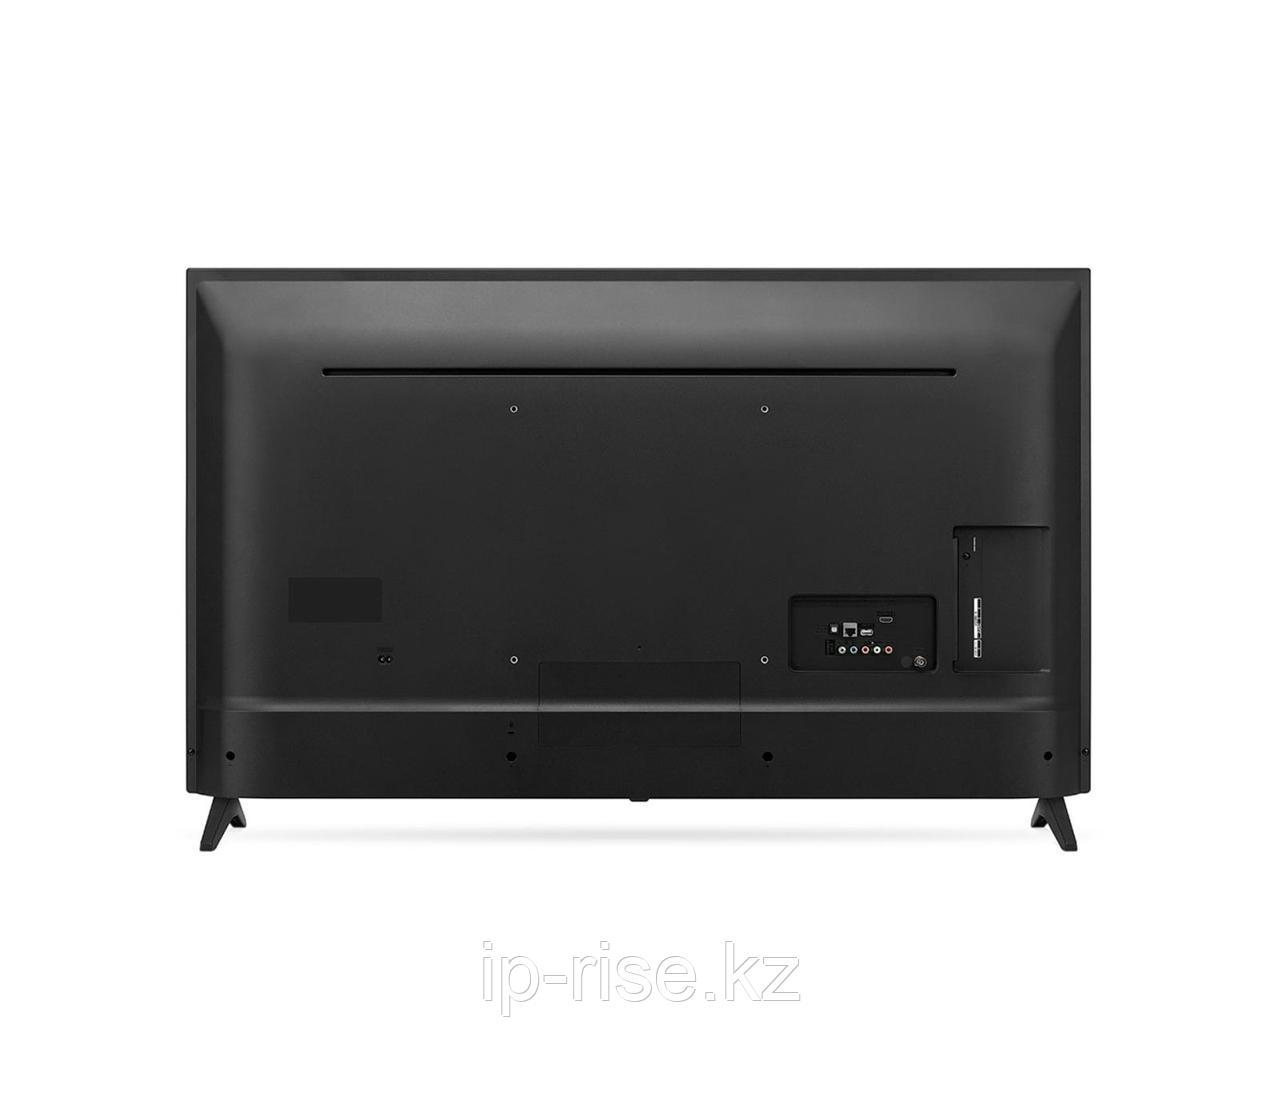 Телевизор LG 43UN74006LA, черный - фото 3